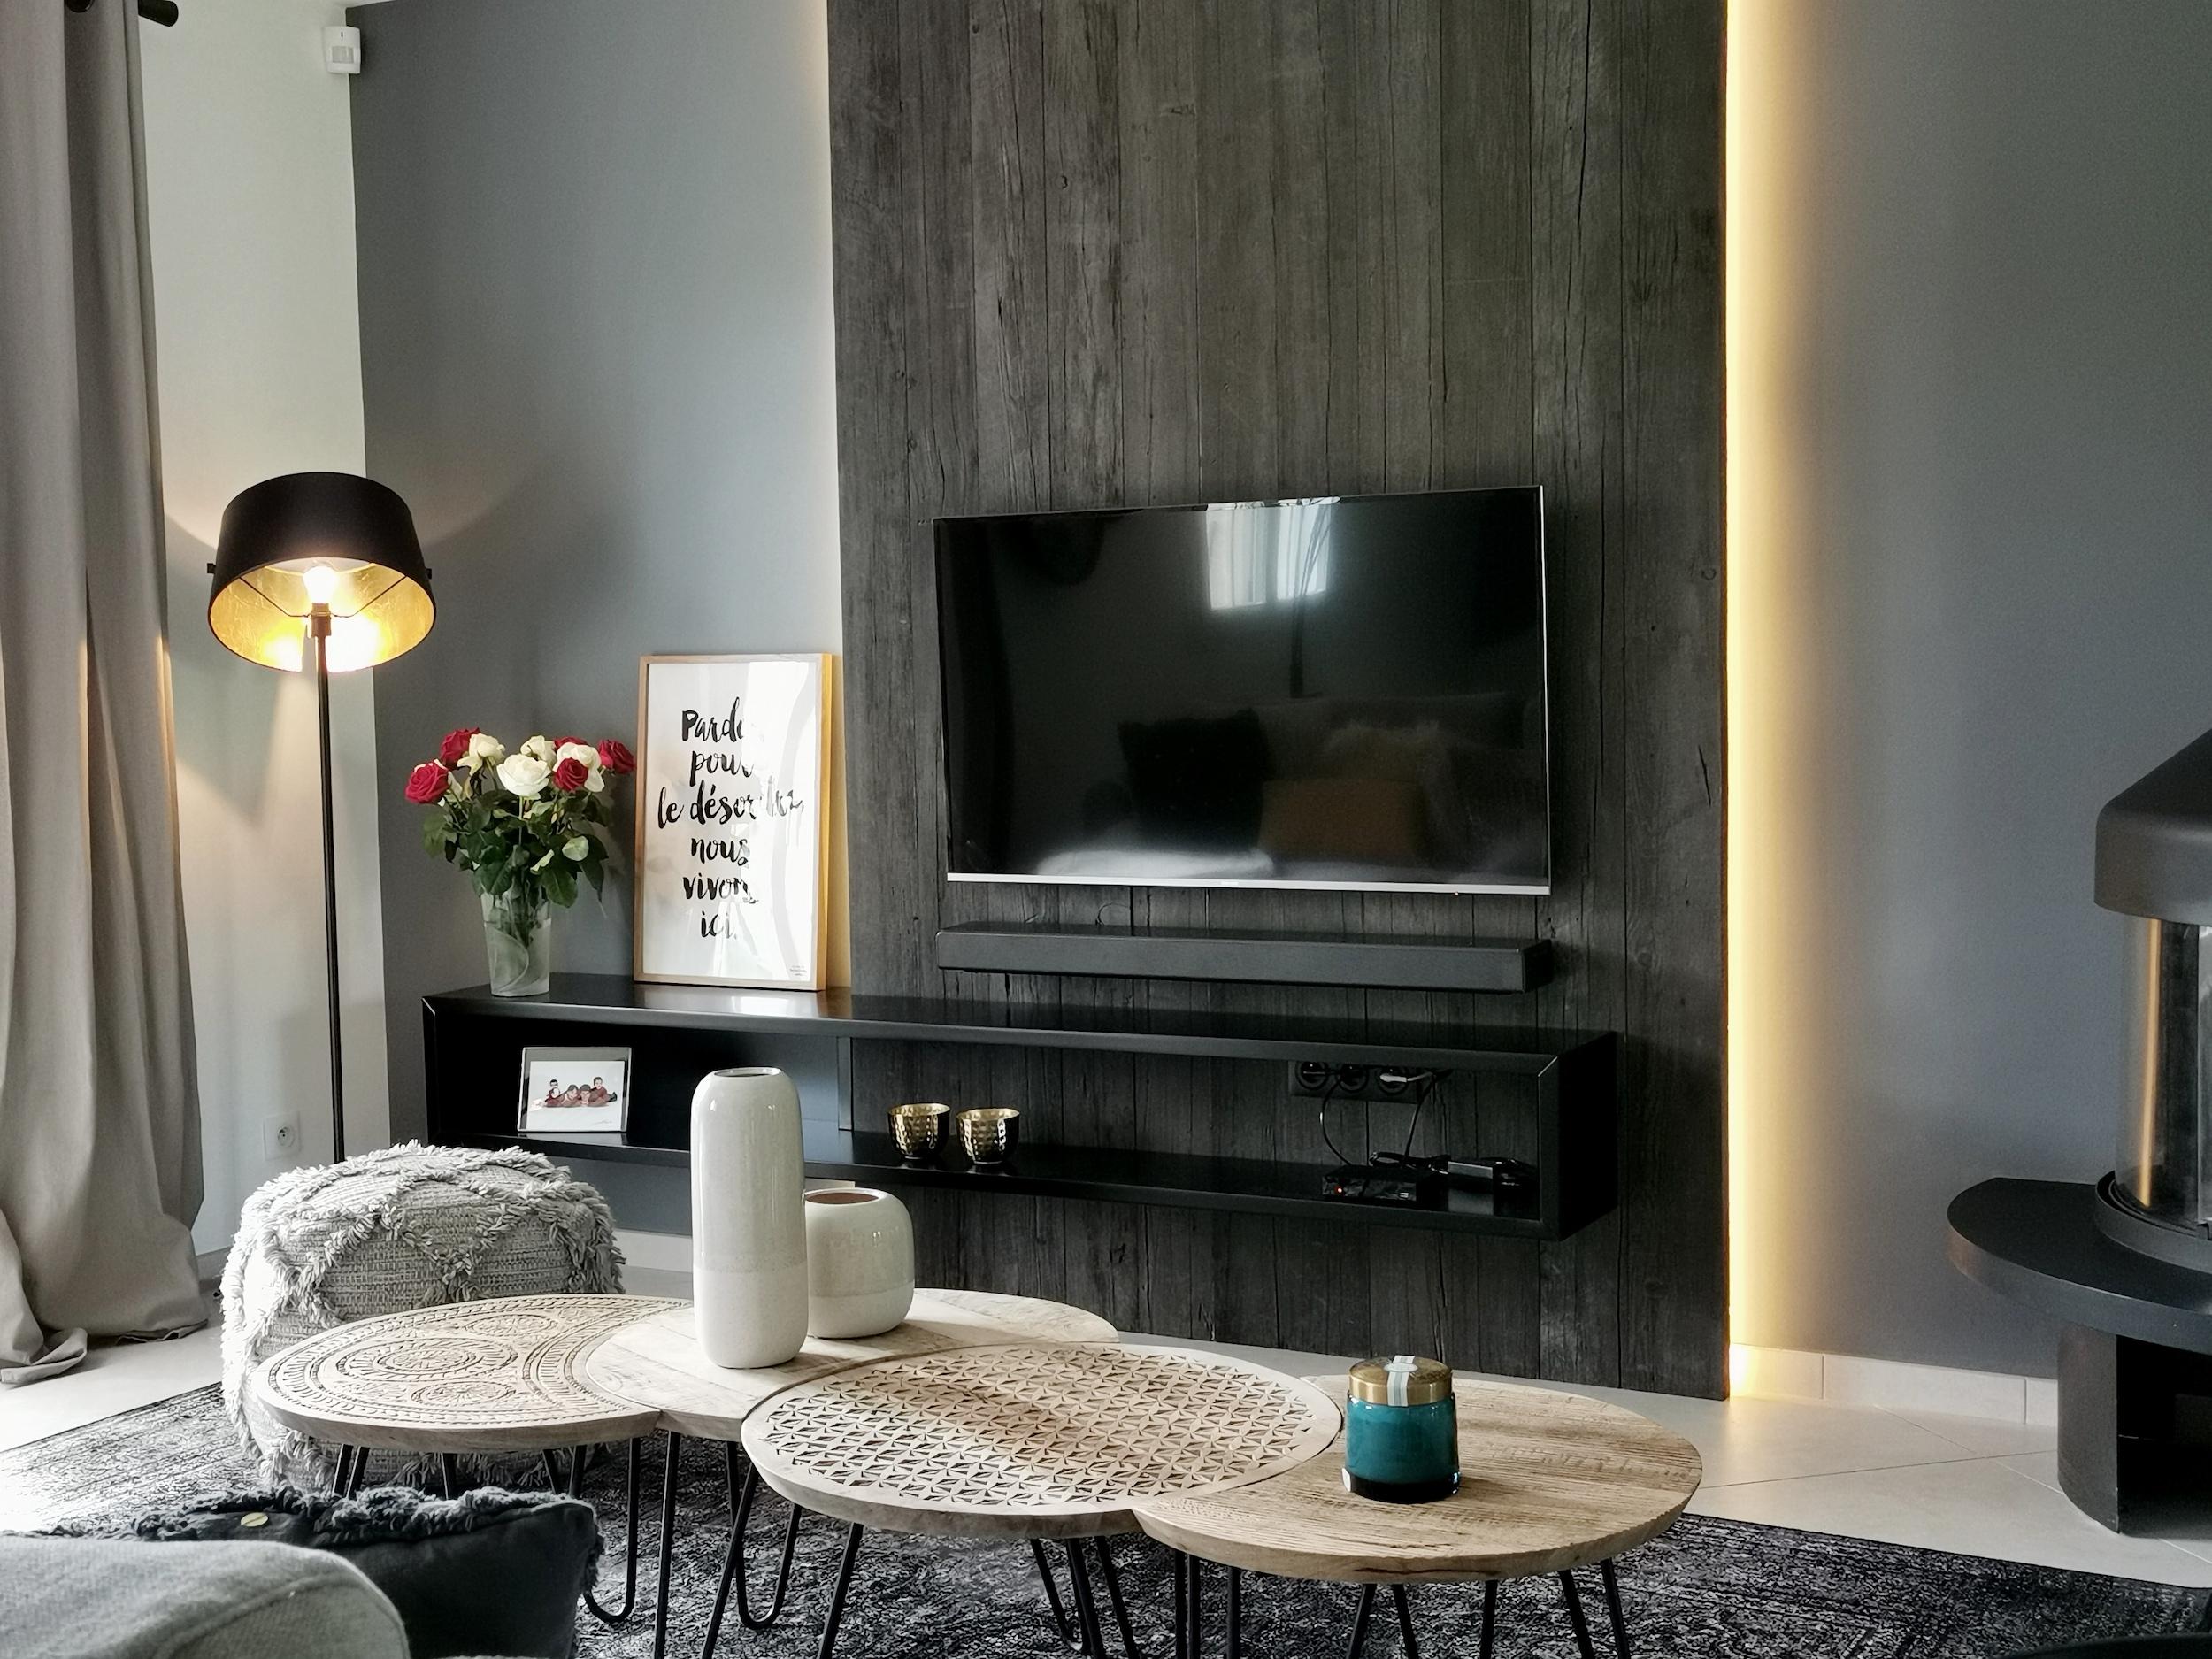 Renovation-maison-salon-serris-77-large-1